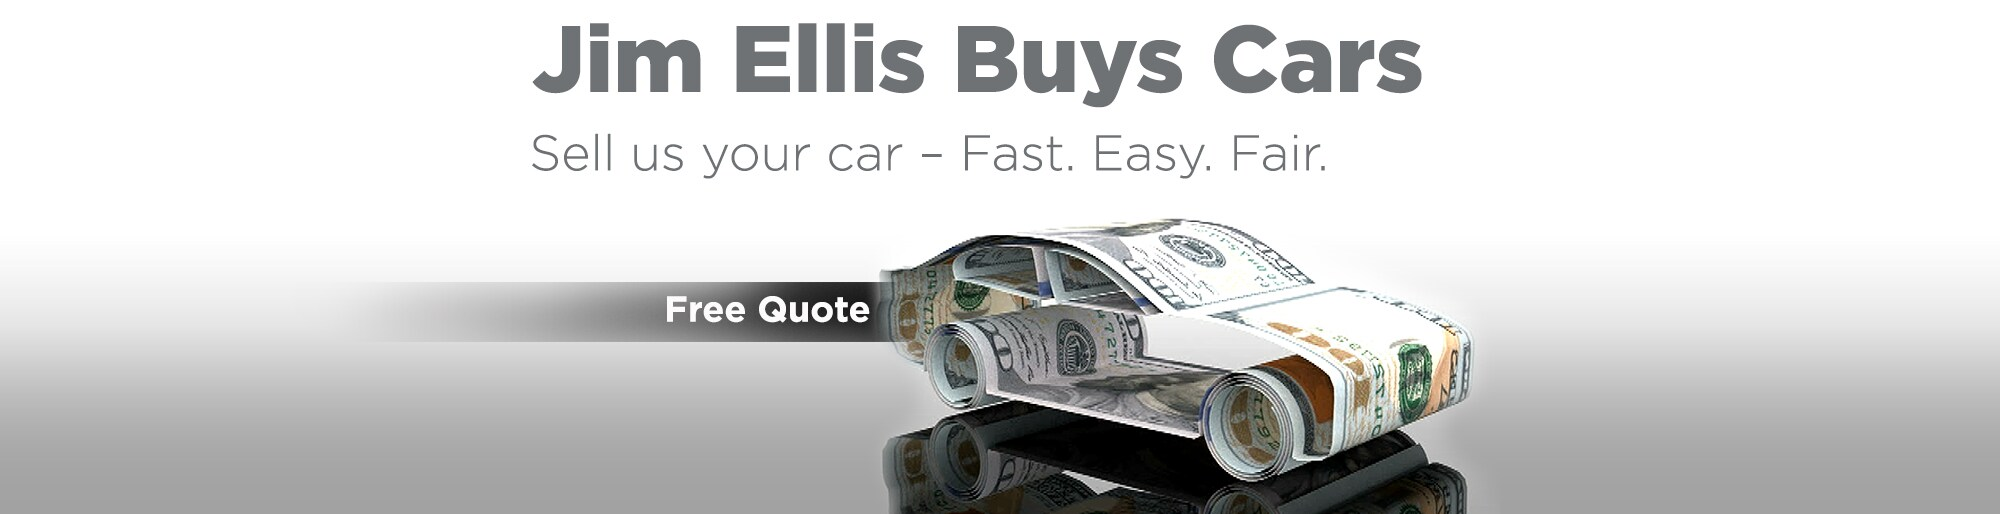 Jim Ellis Buick Gmc Atlanta Ga New Used Cars Dealership 2015 Canyon Oil Filter Location Previous Pause Next